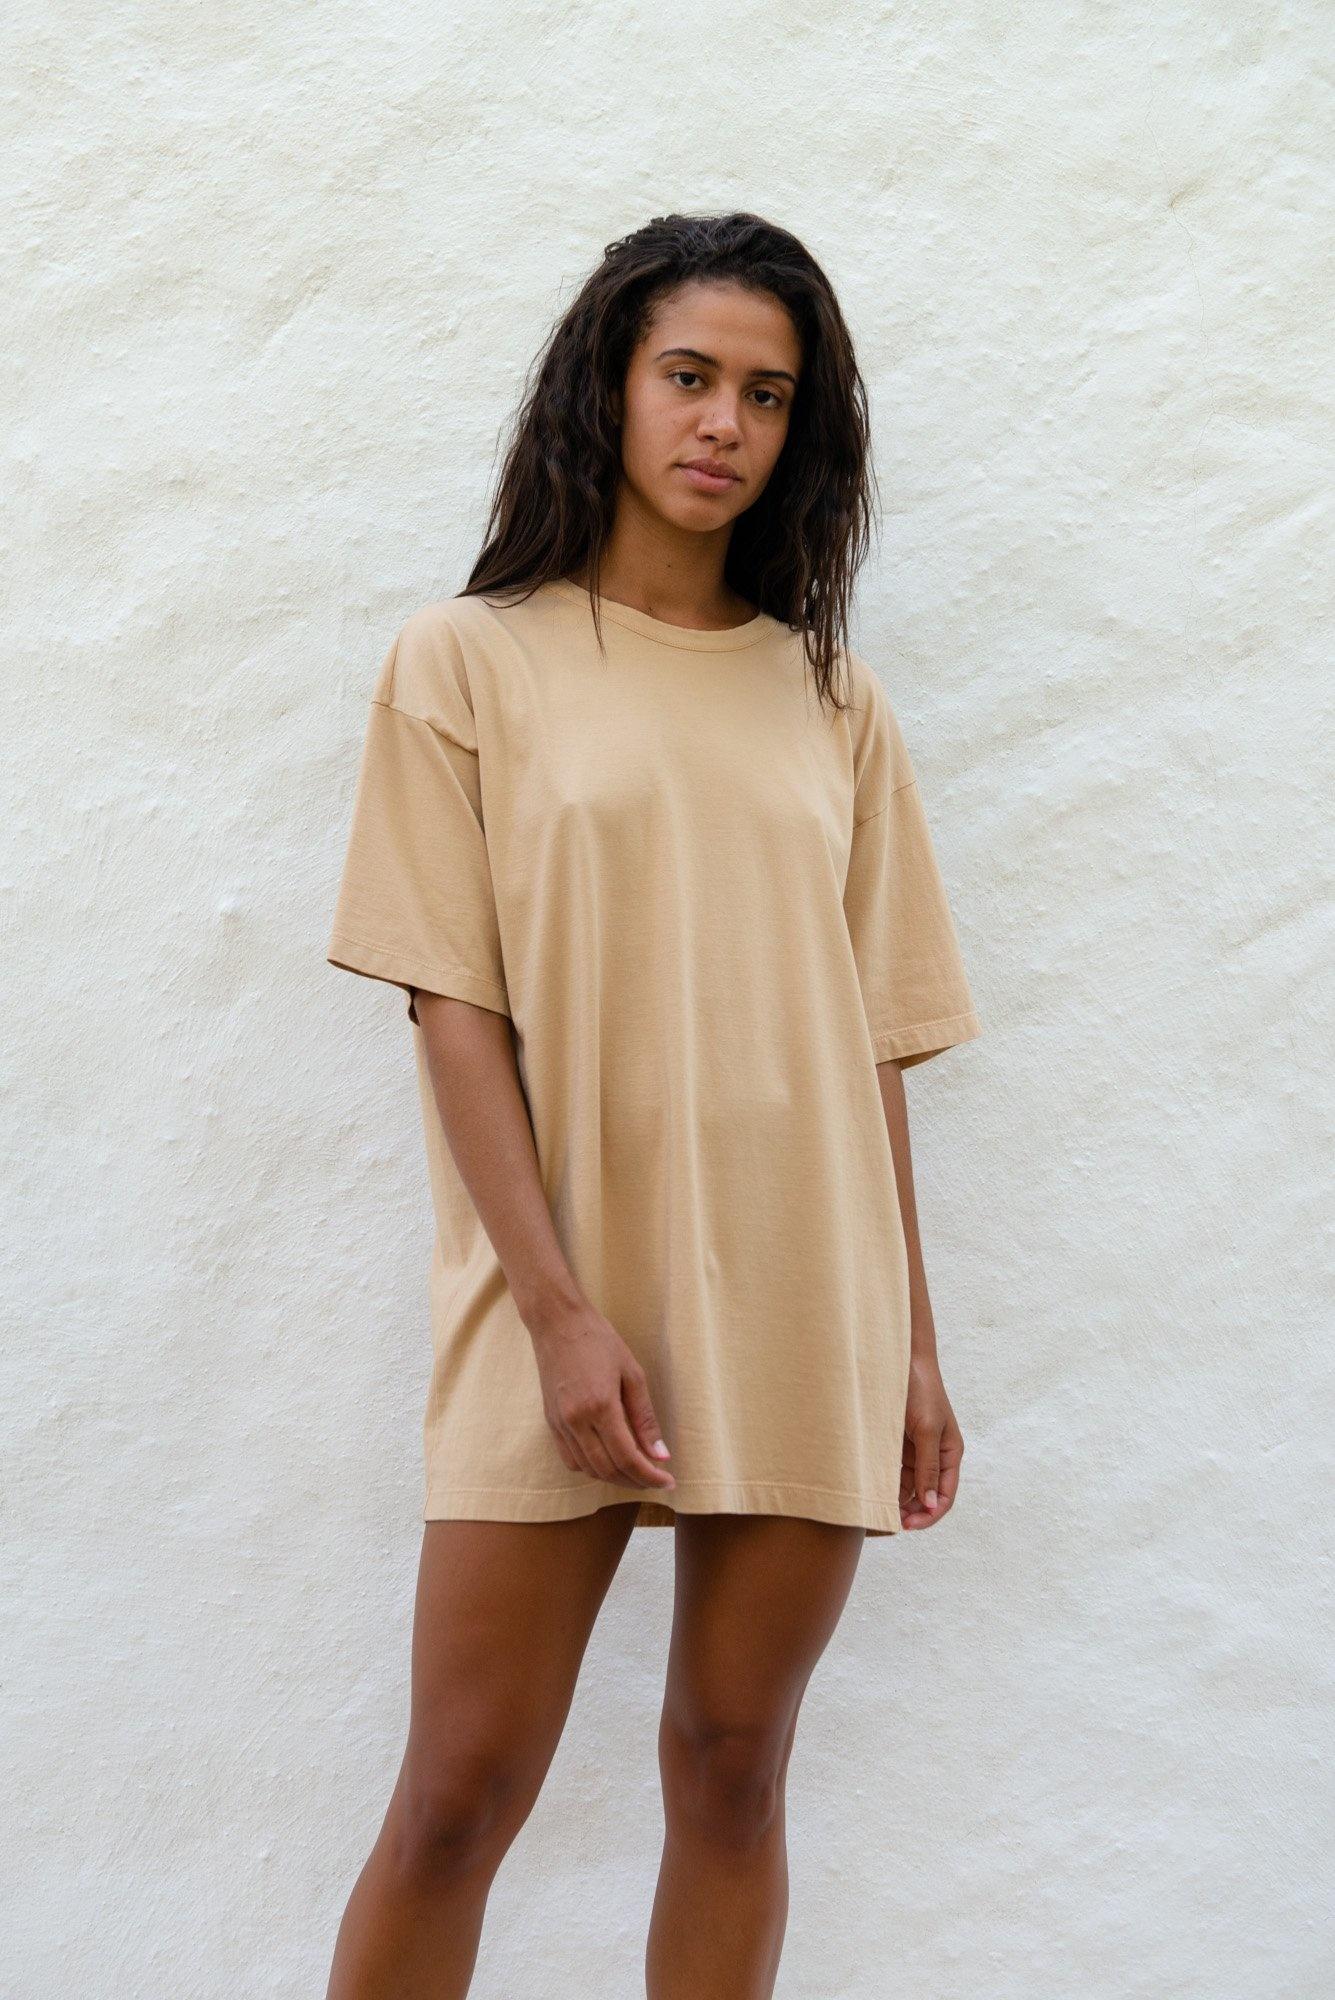 Unisex T-shirt S/S Latte